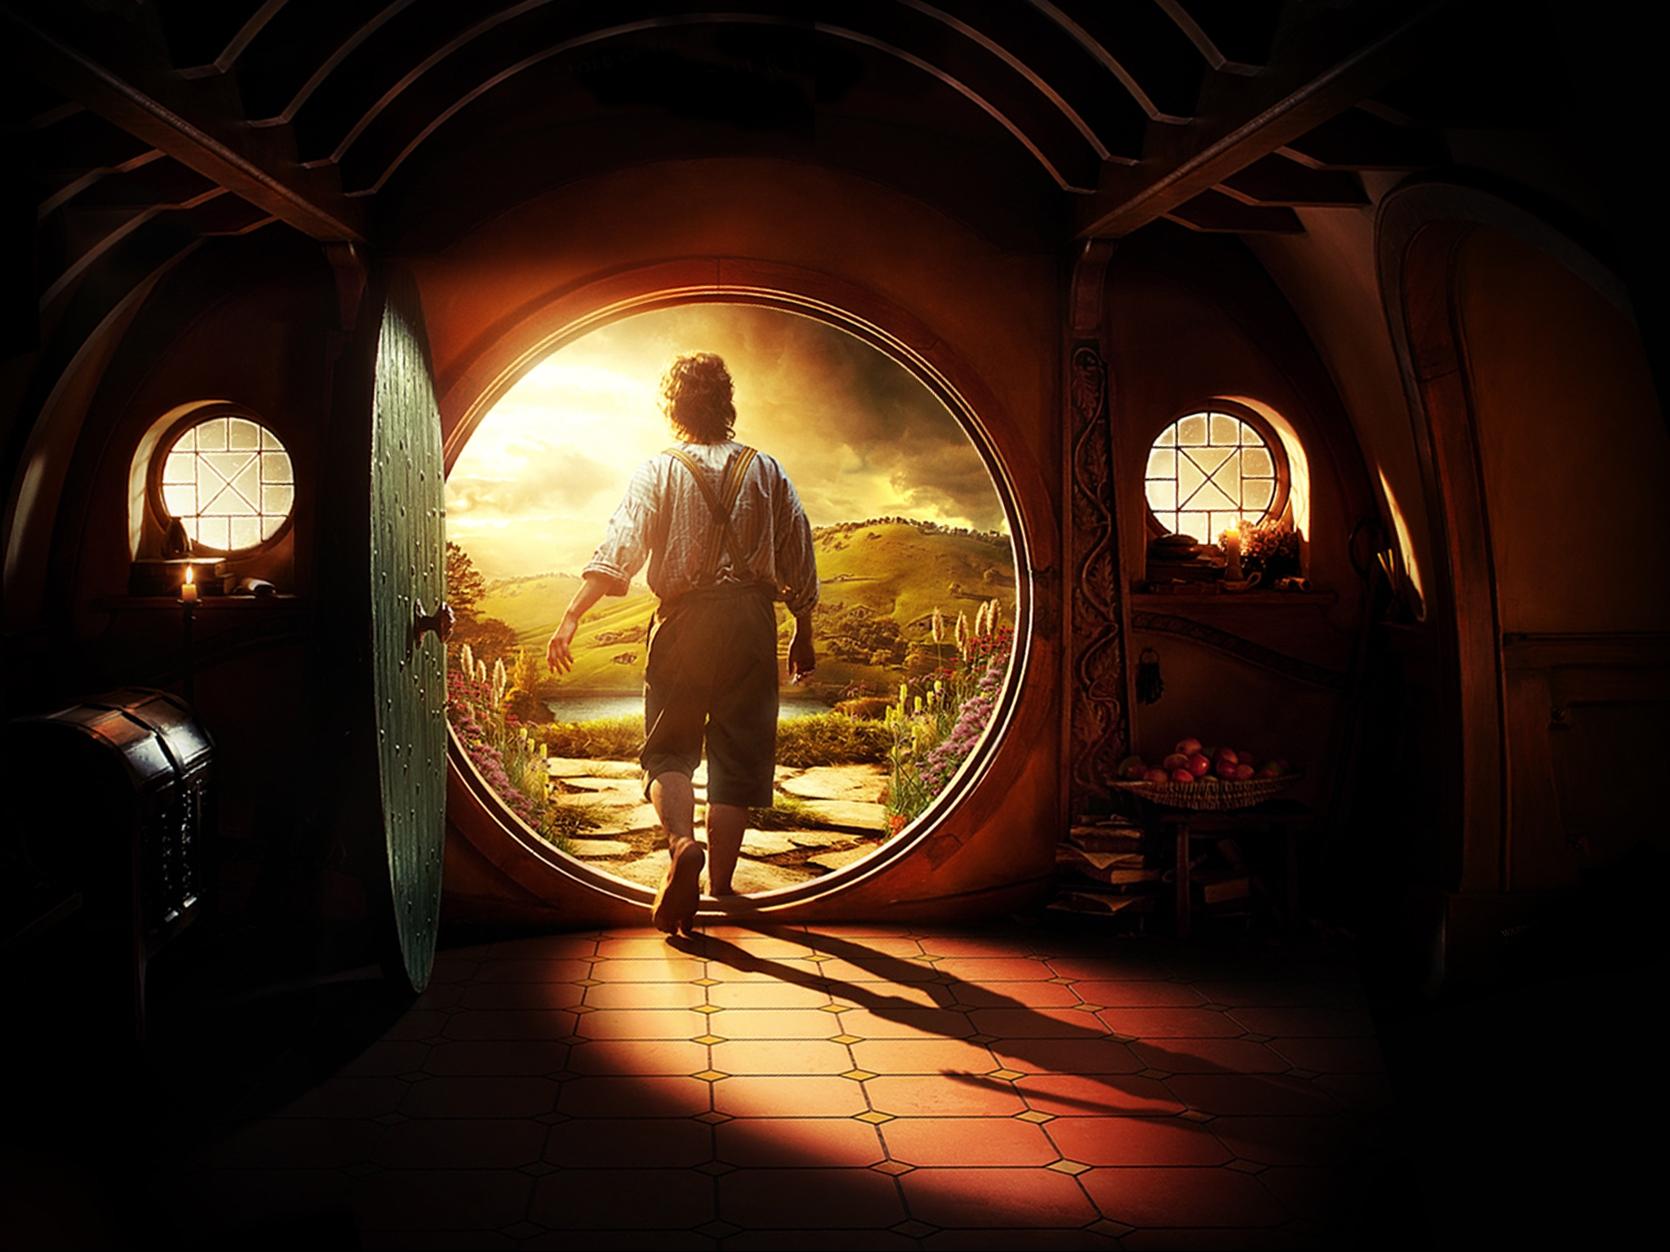 'The Hobbit' Review: Fantasy Prequel Lacks Fellowship, Focus